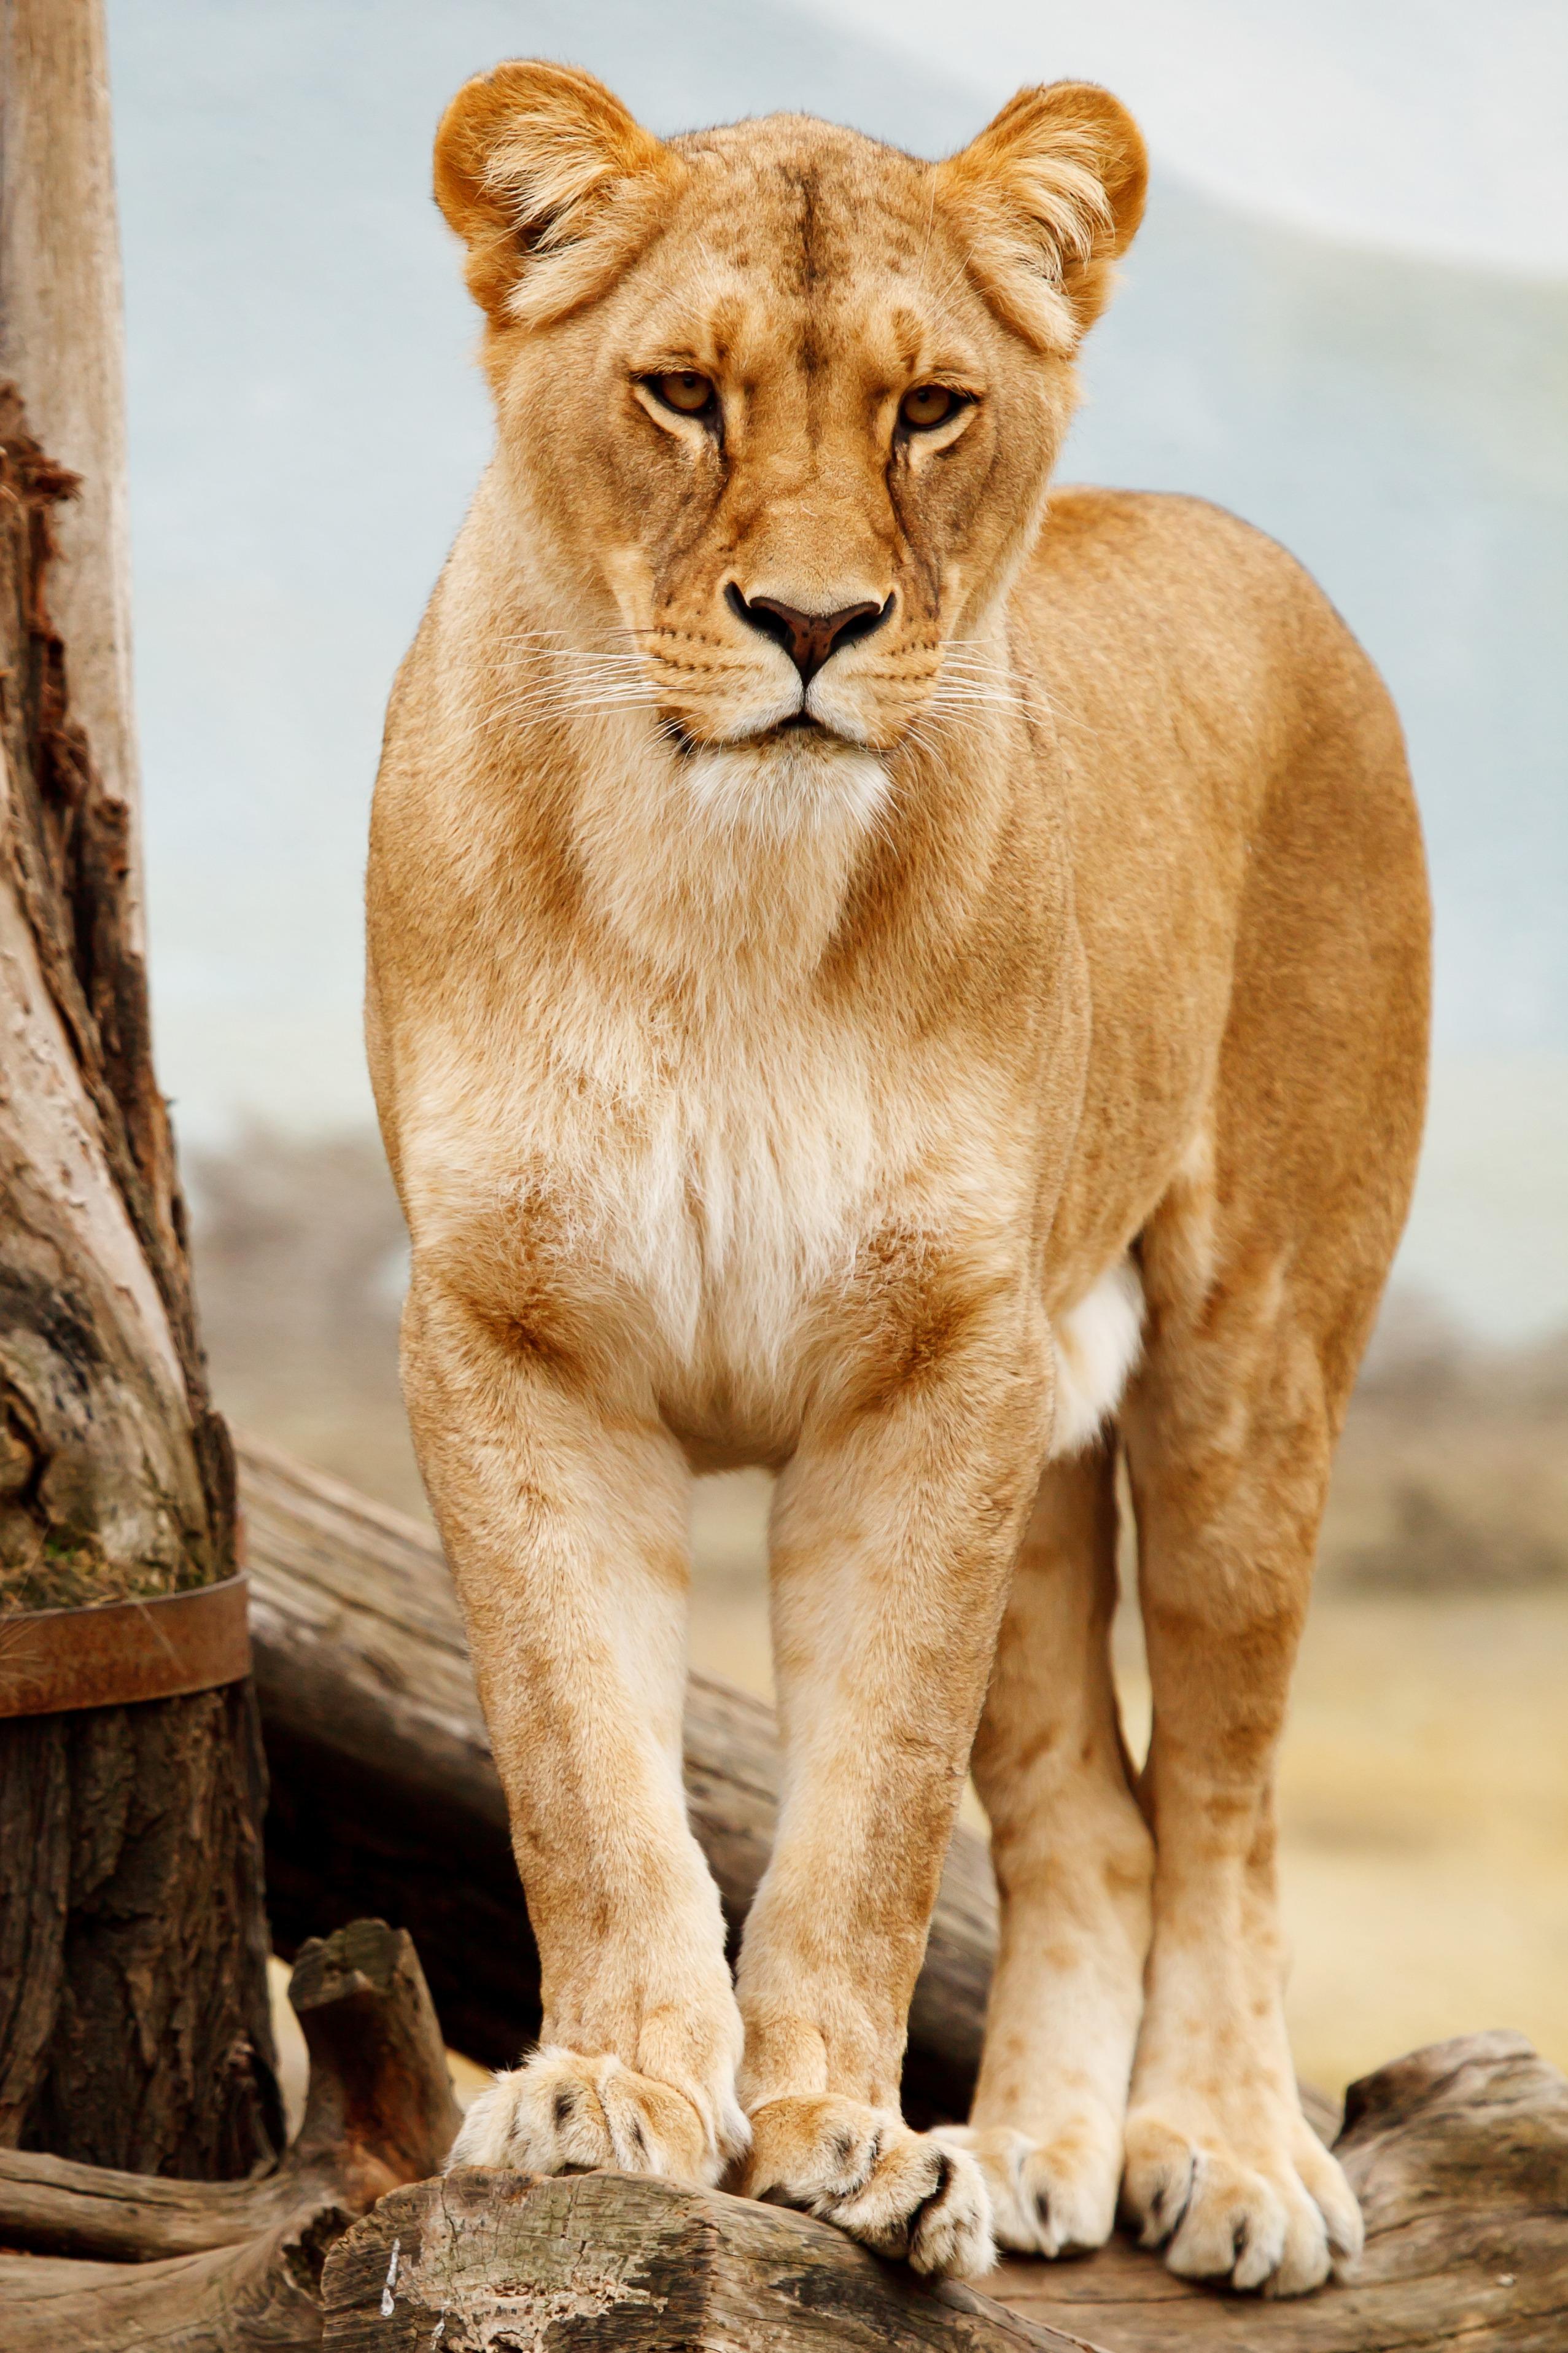 Free stock photo of animal, big, standing, fur